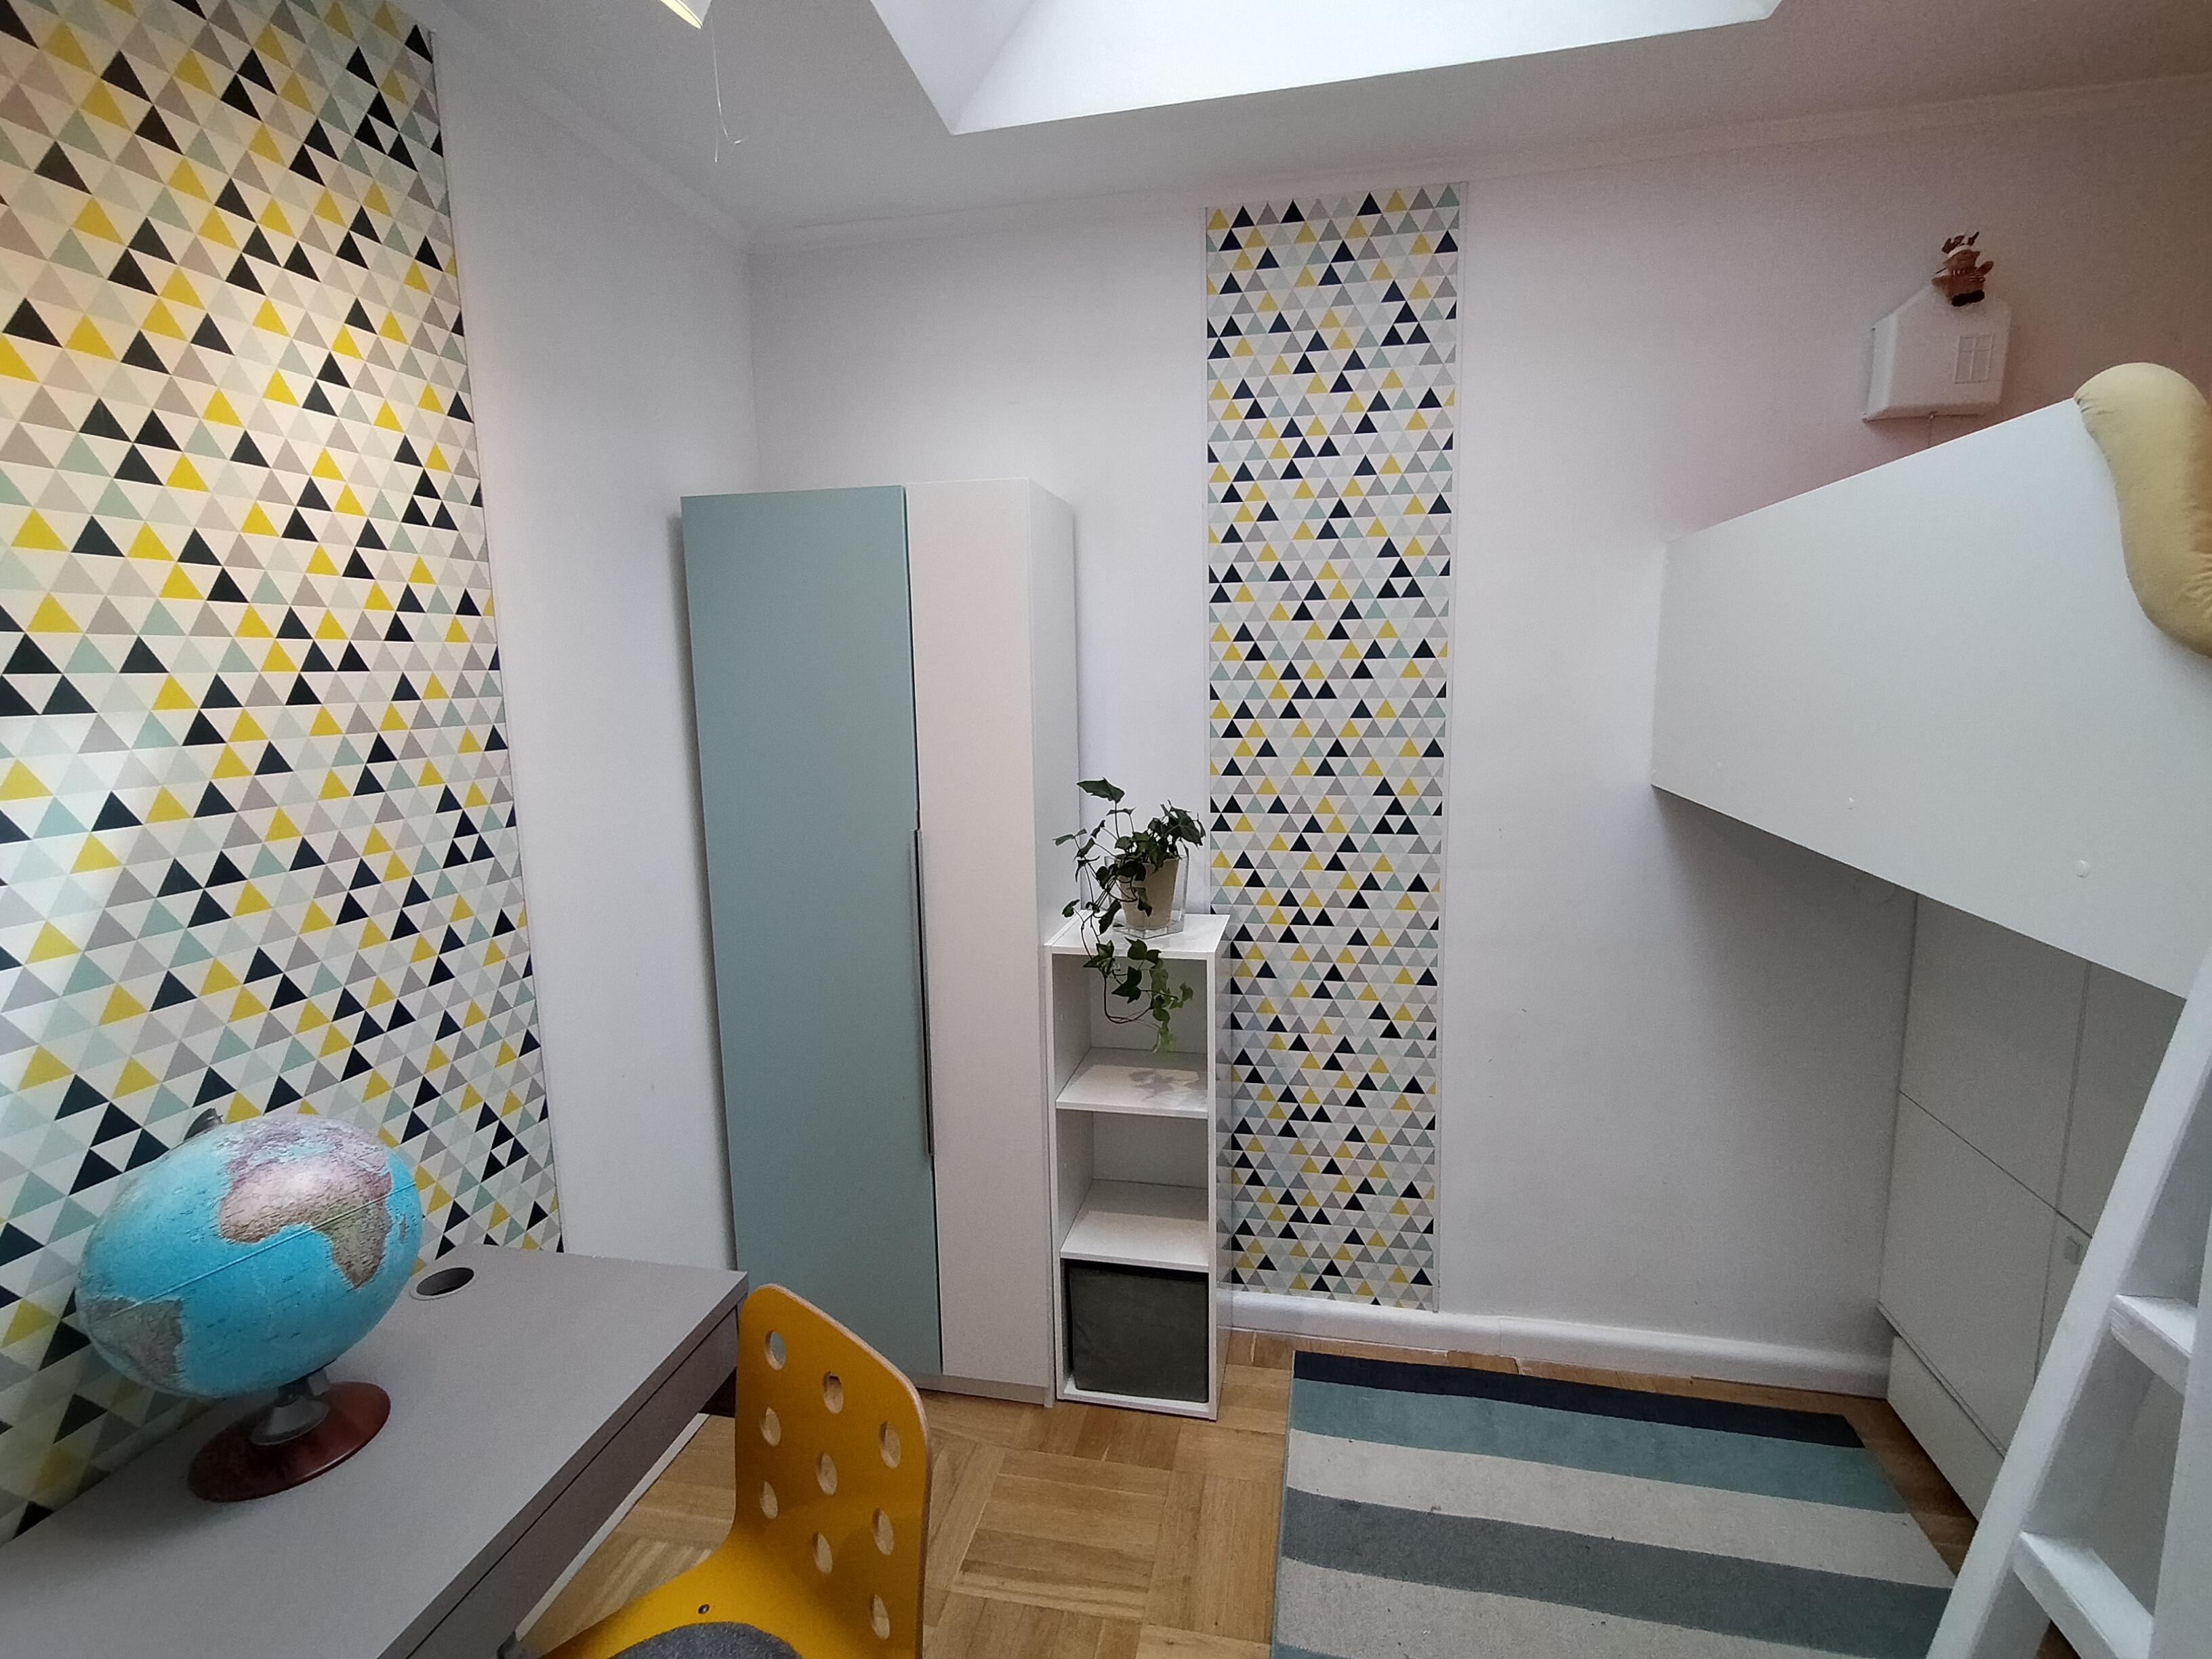 Projekt: Pokój młodego podróżnika | Artis Design: Studio projektowe